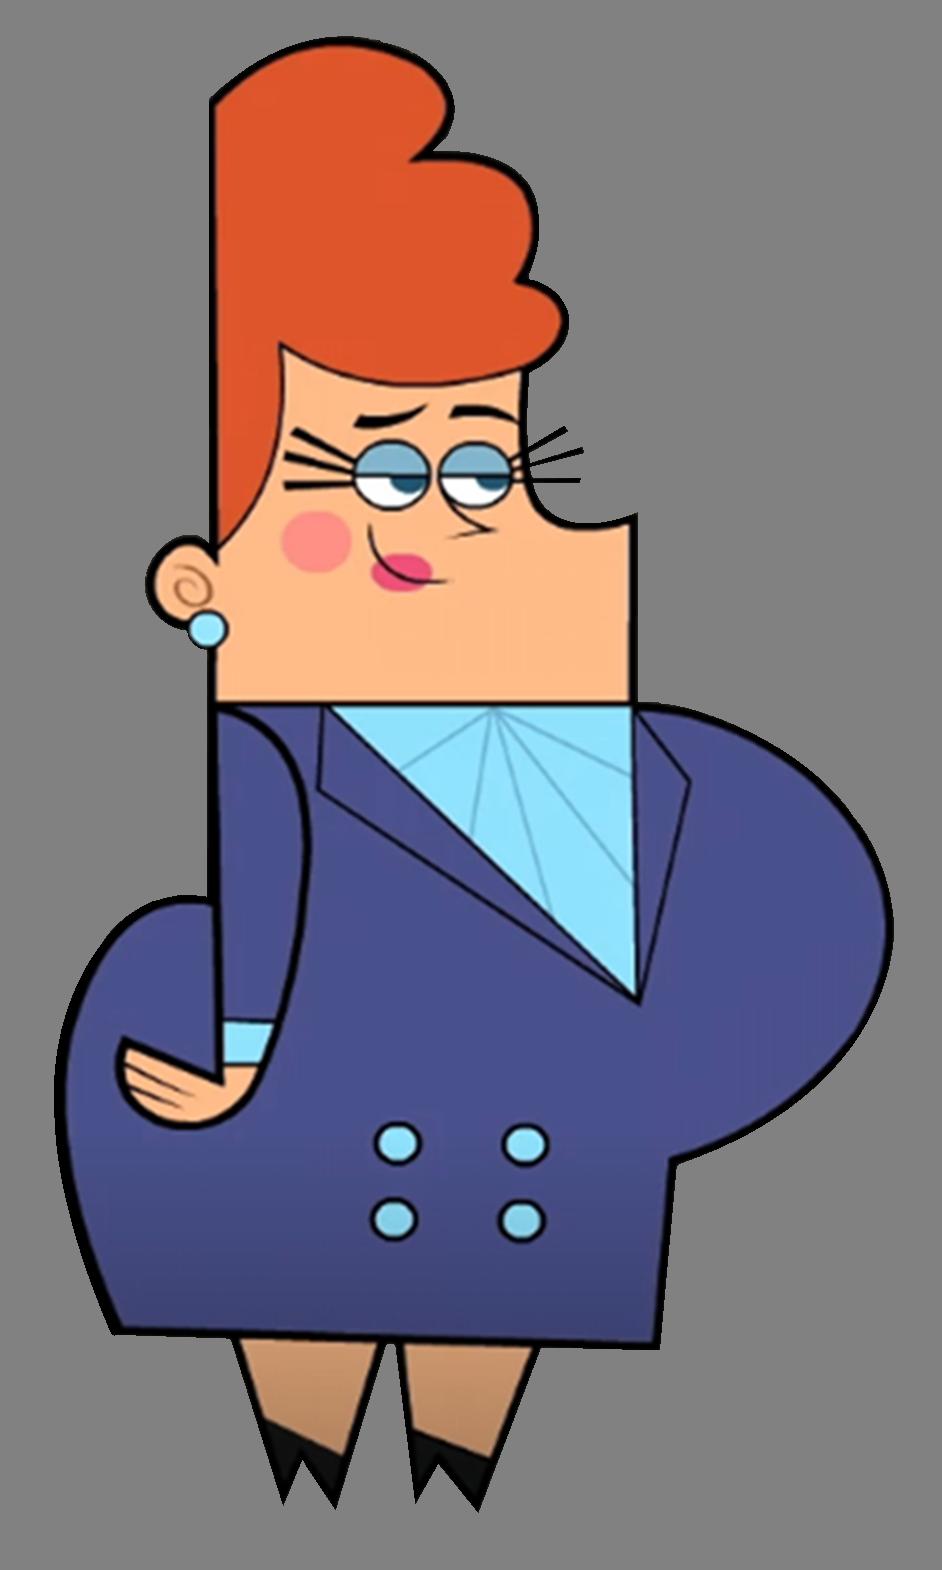 Female school principal clipart vector transparent stock Geraldine Waxelplax | Fairly Odd Parents Wiki | FANDOM powered by Wikia vector transparent stock